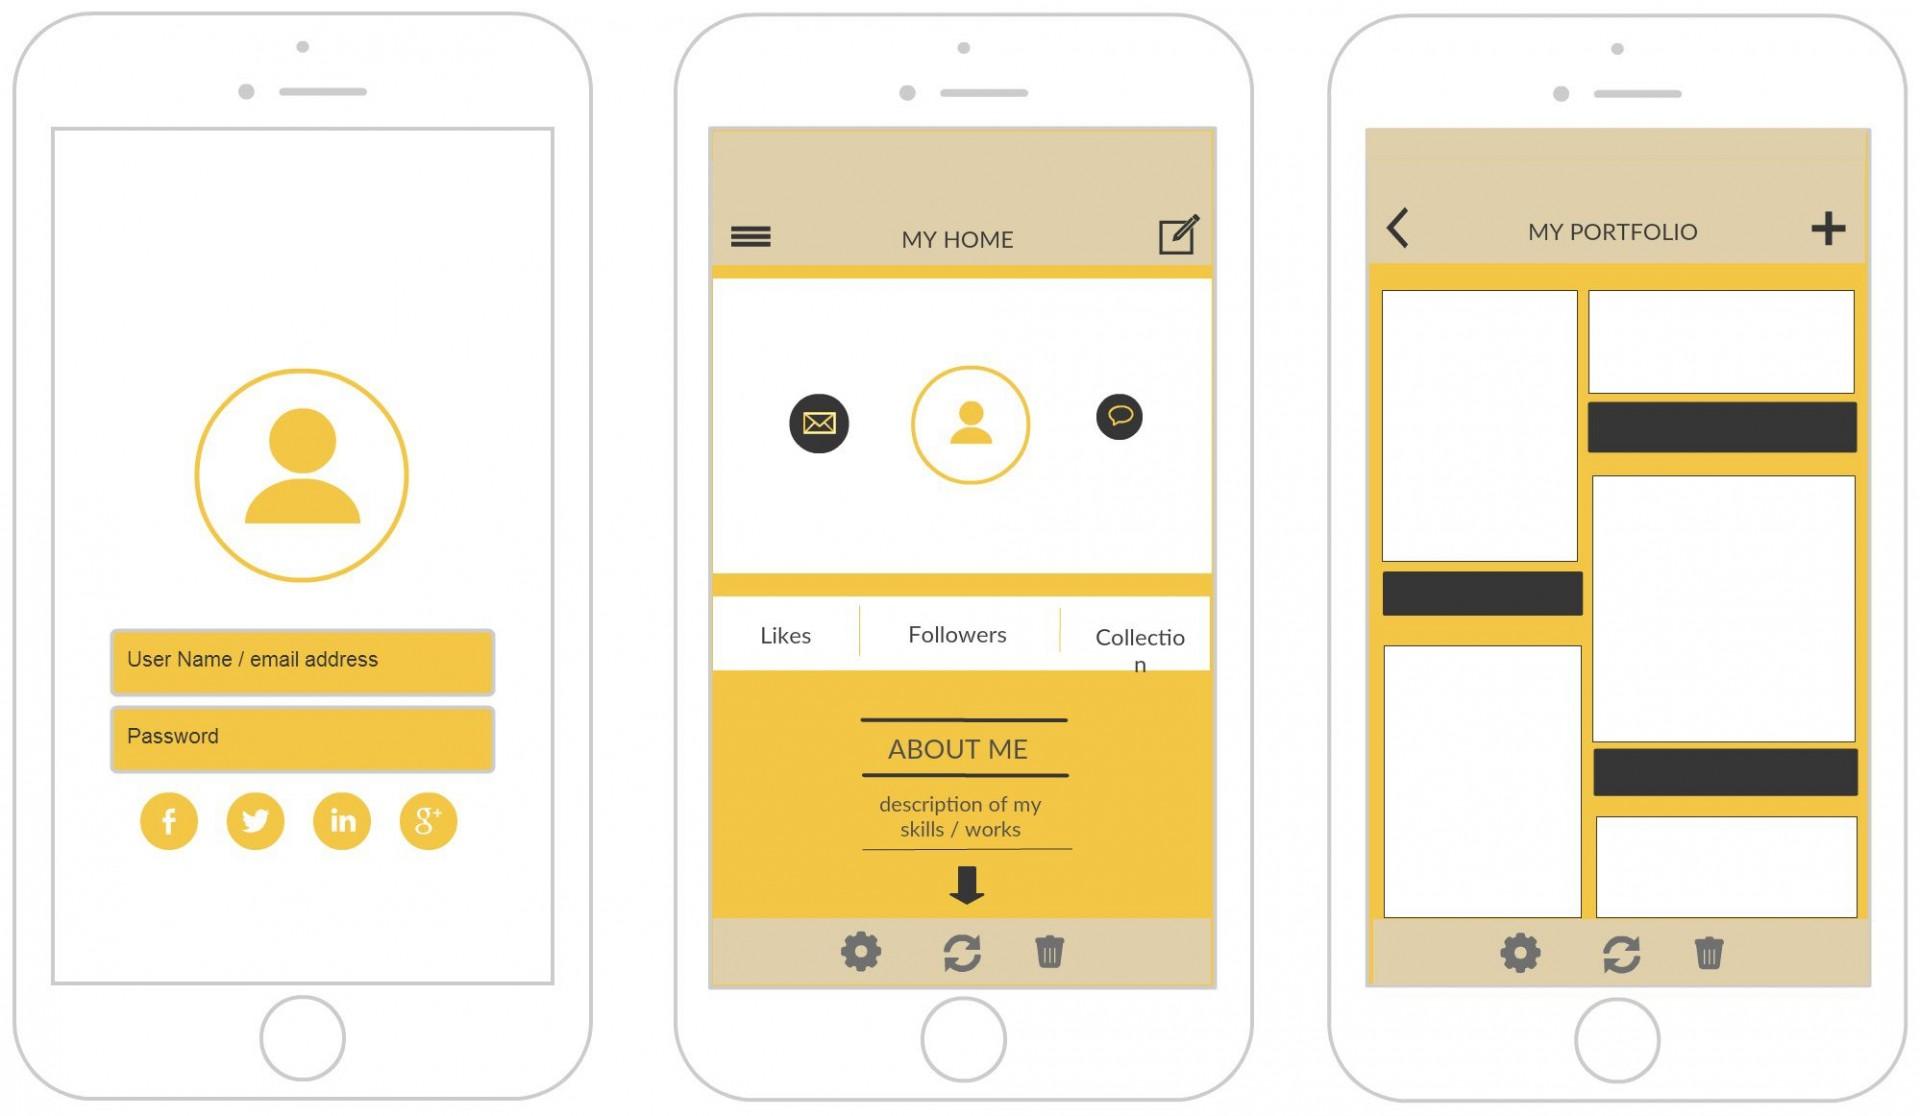 006 Stunning Iphone App Design Template Inspiration  X Io Sketch1920